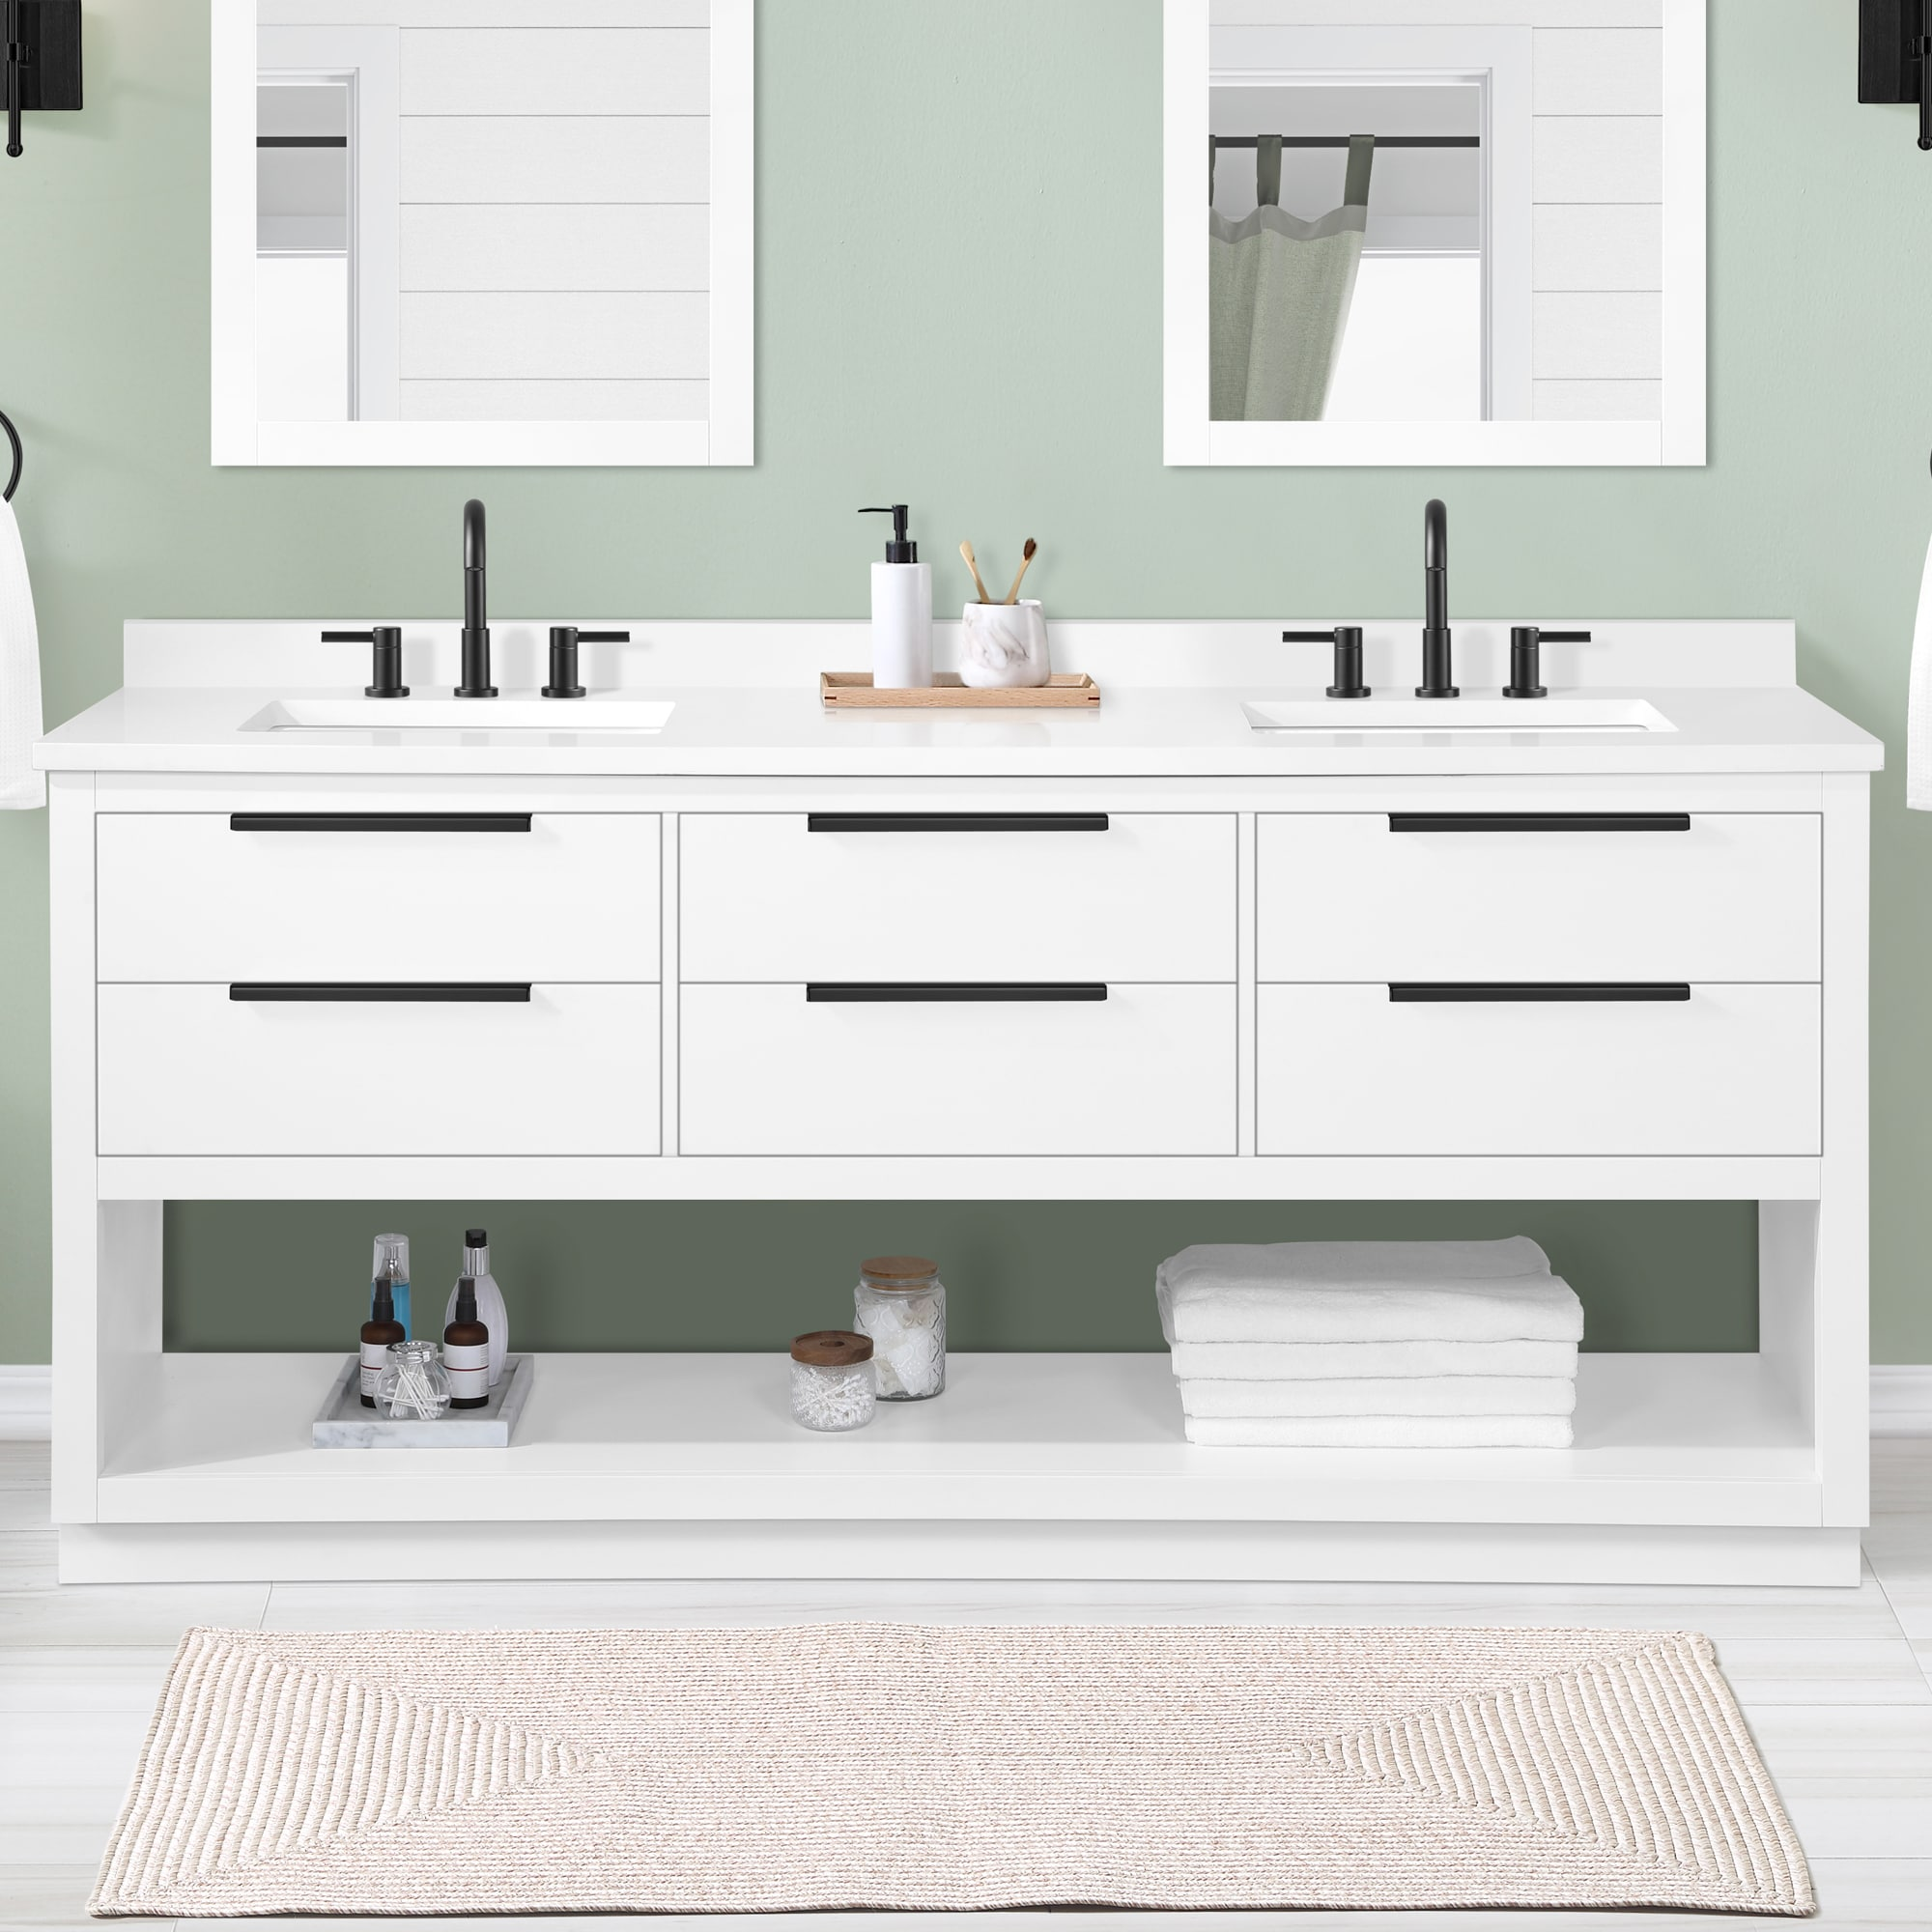 Origin 20 Beecham 20 in White Undermount Double Sink Bathroom Vanity with  White Engineered Stone Top